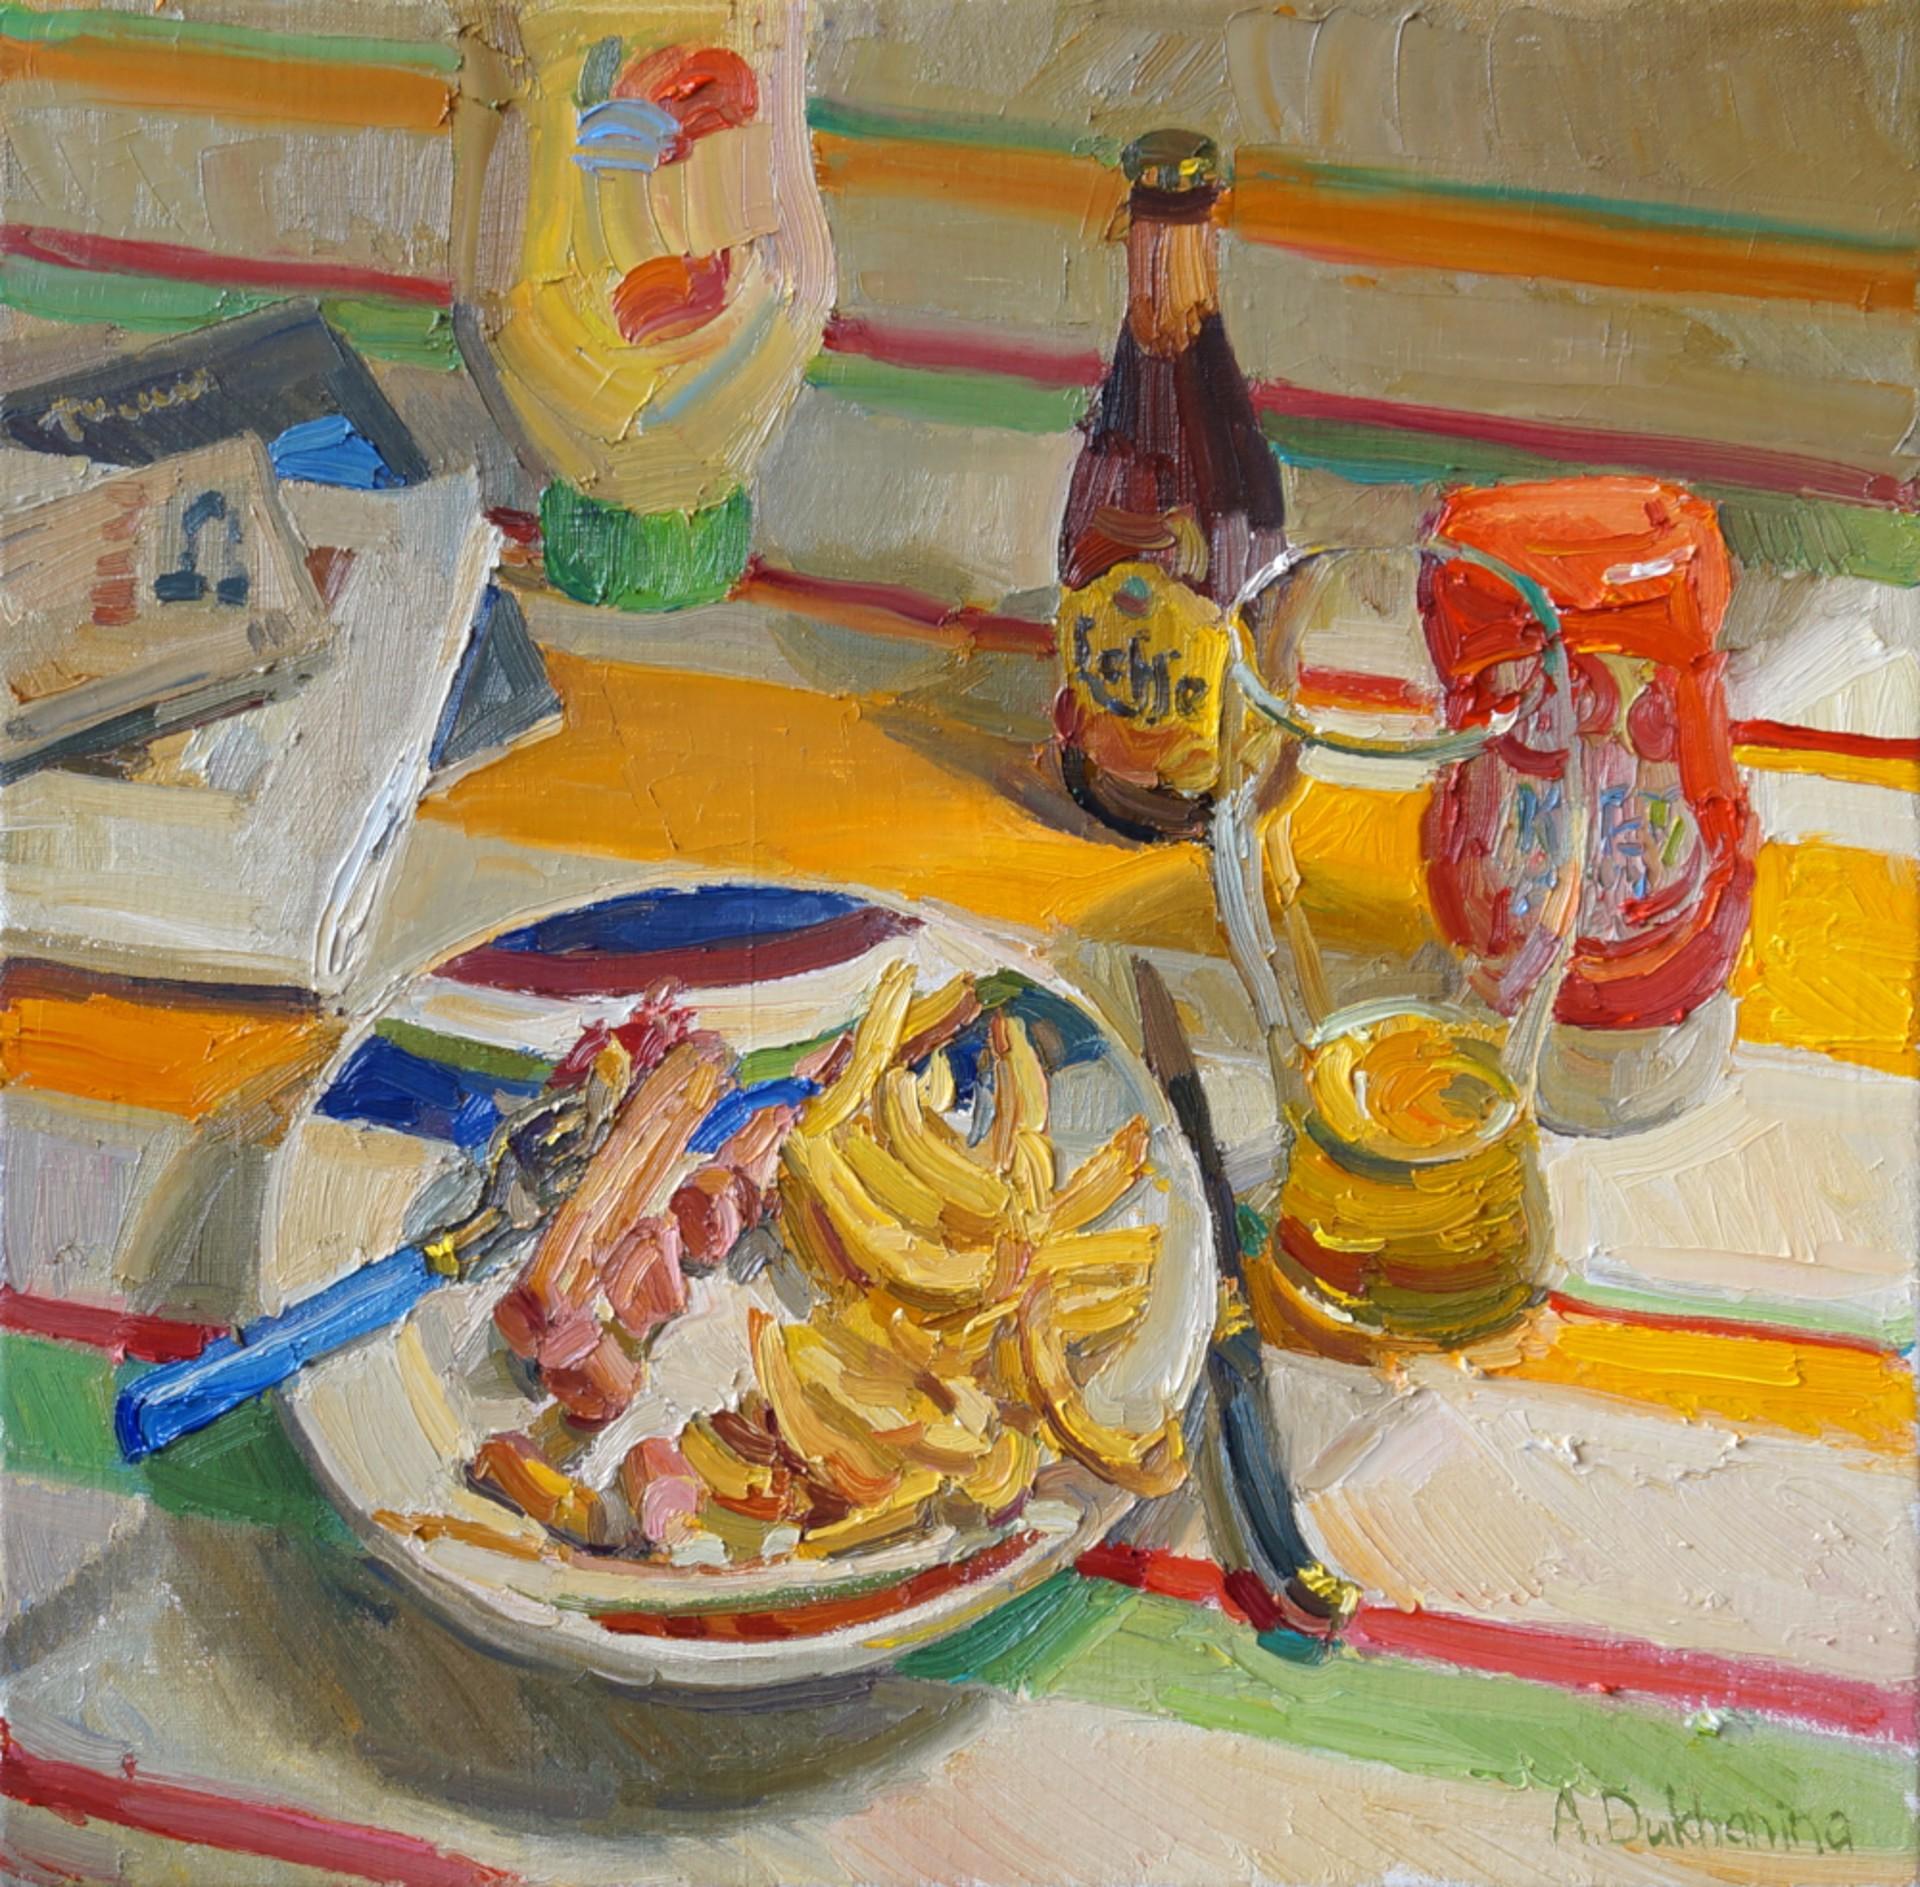 Dinner by Anastasia Dukhanina